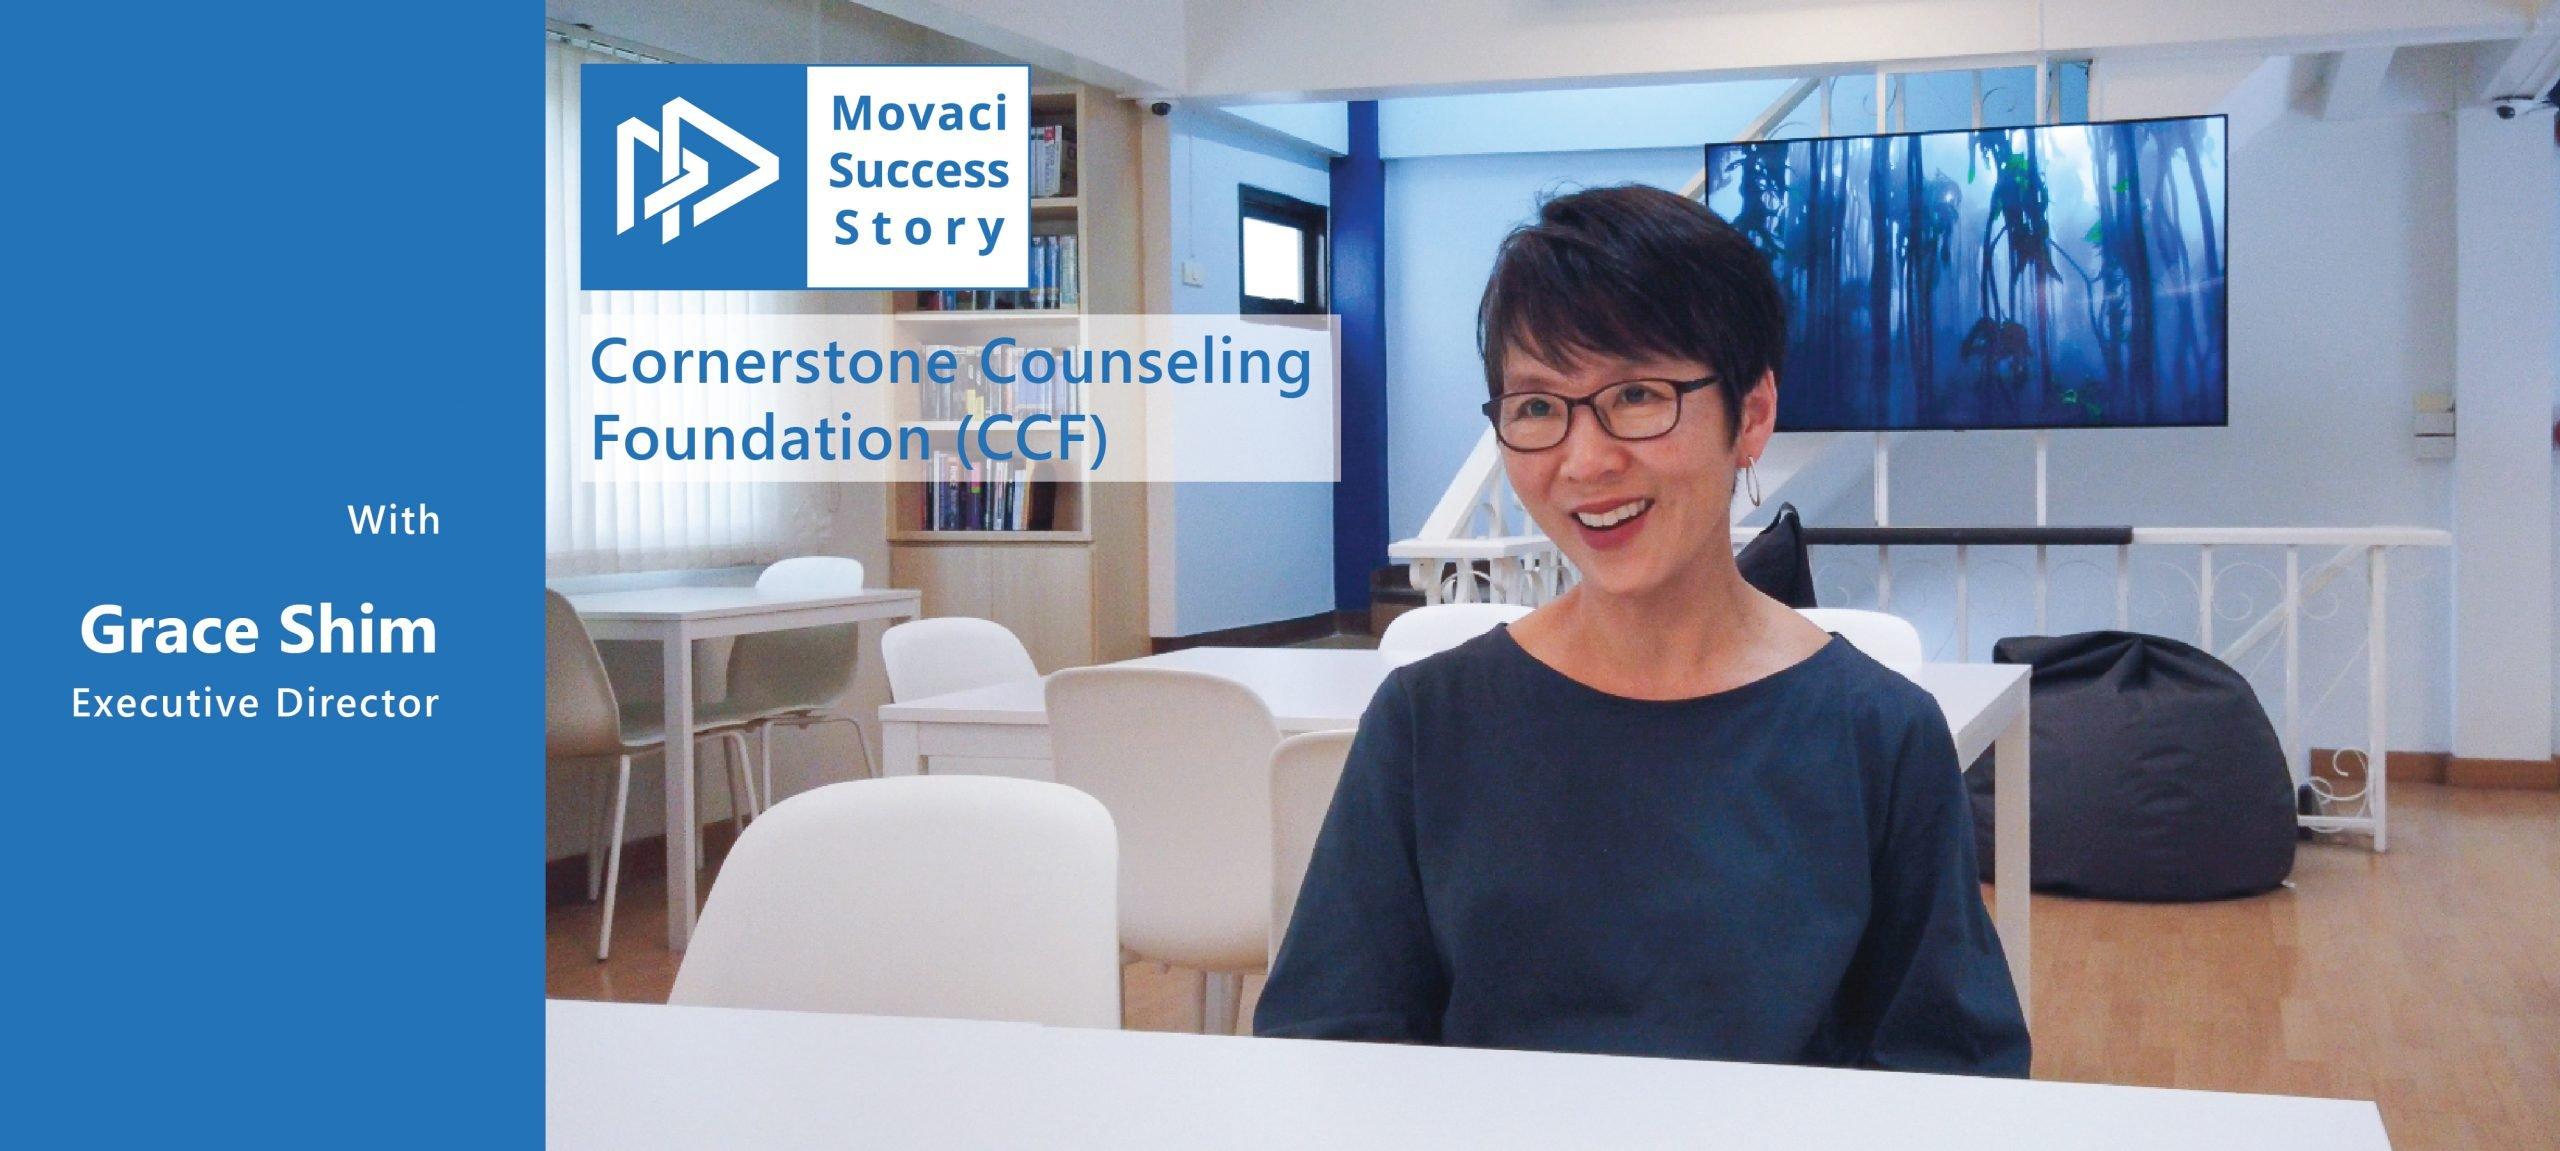 Movaci Success Story: Cornerstone Counseling Foundation (CCF) 1